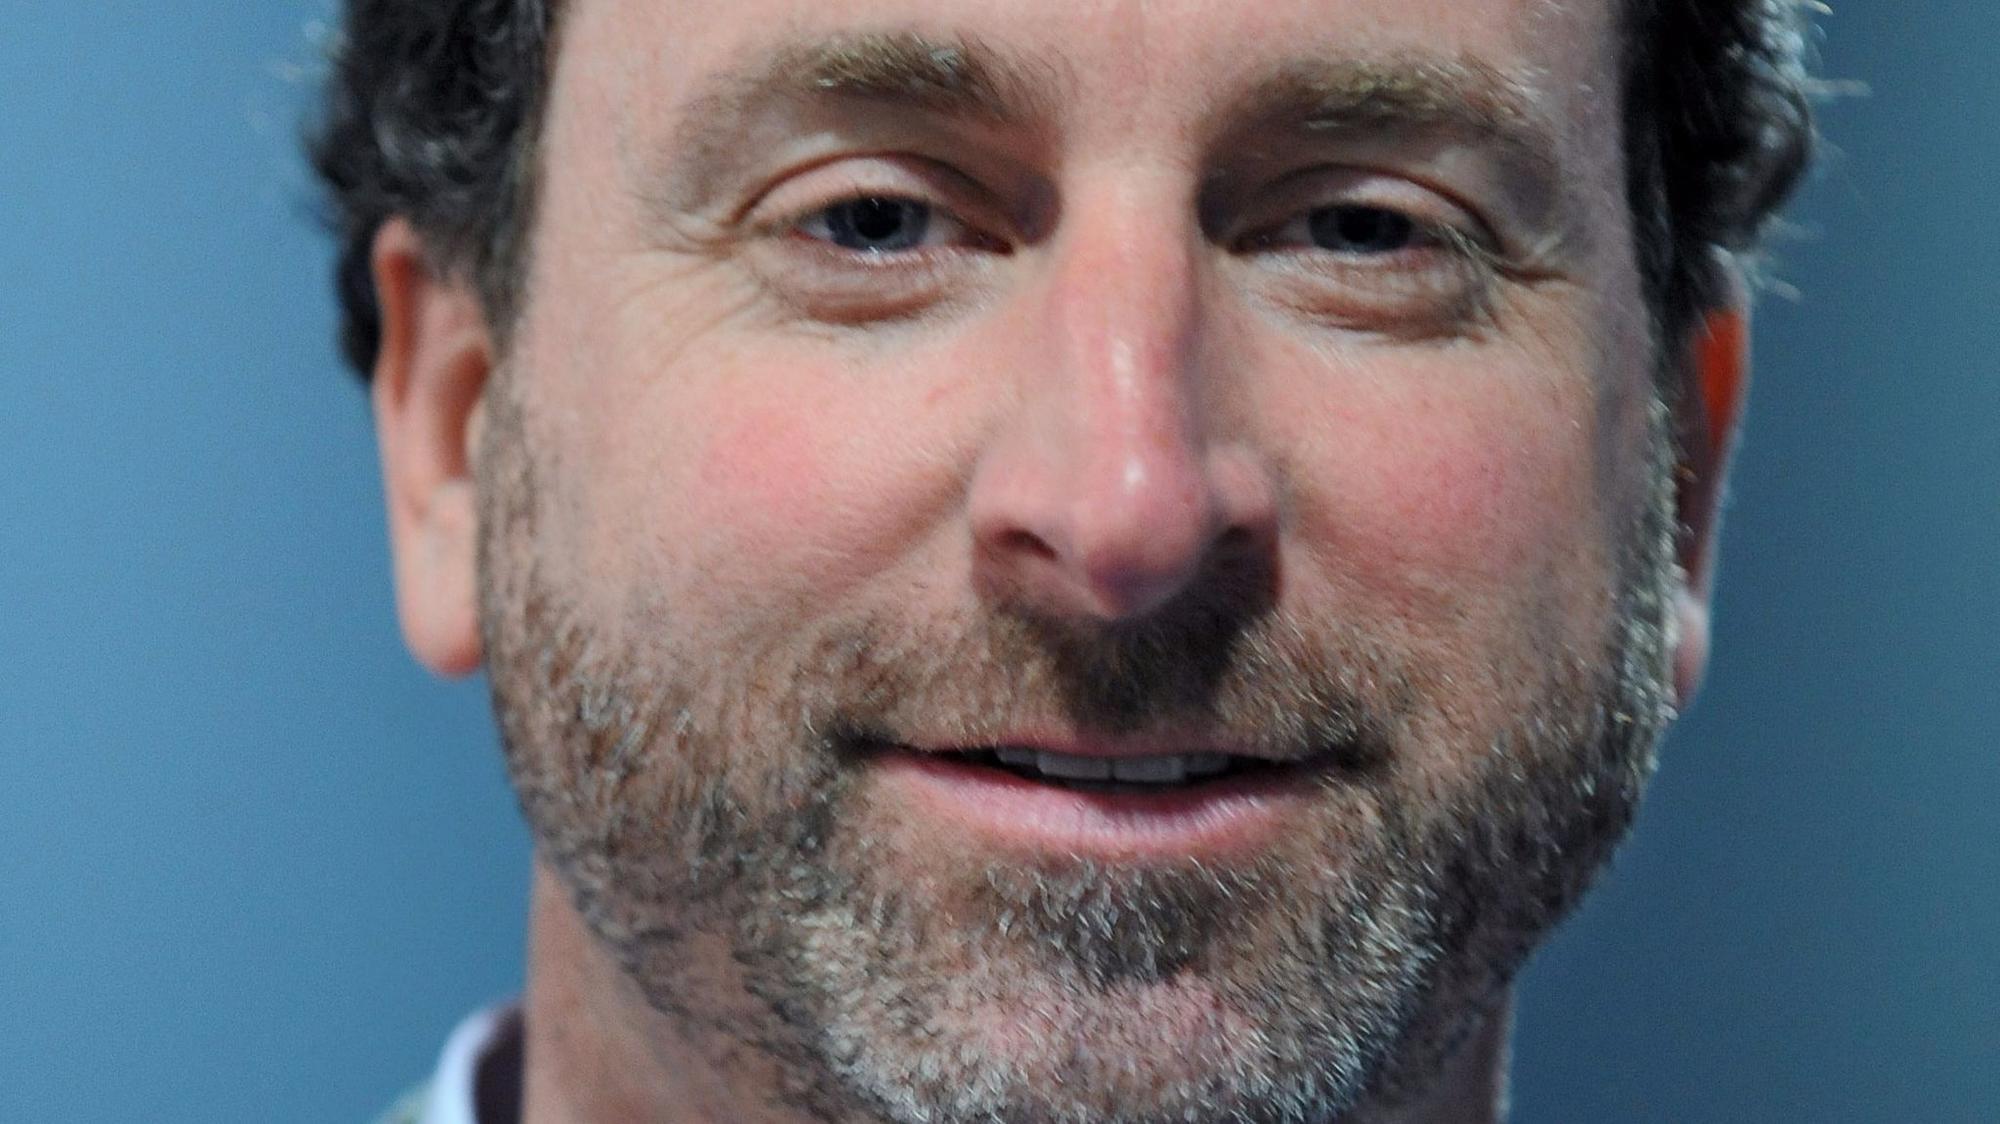 developer scott plank accused of exposing himself